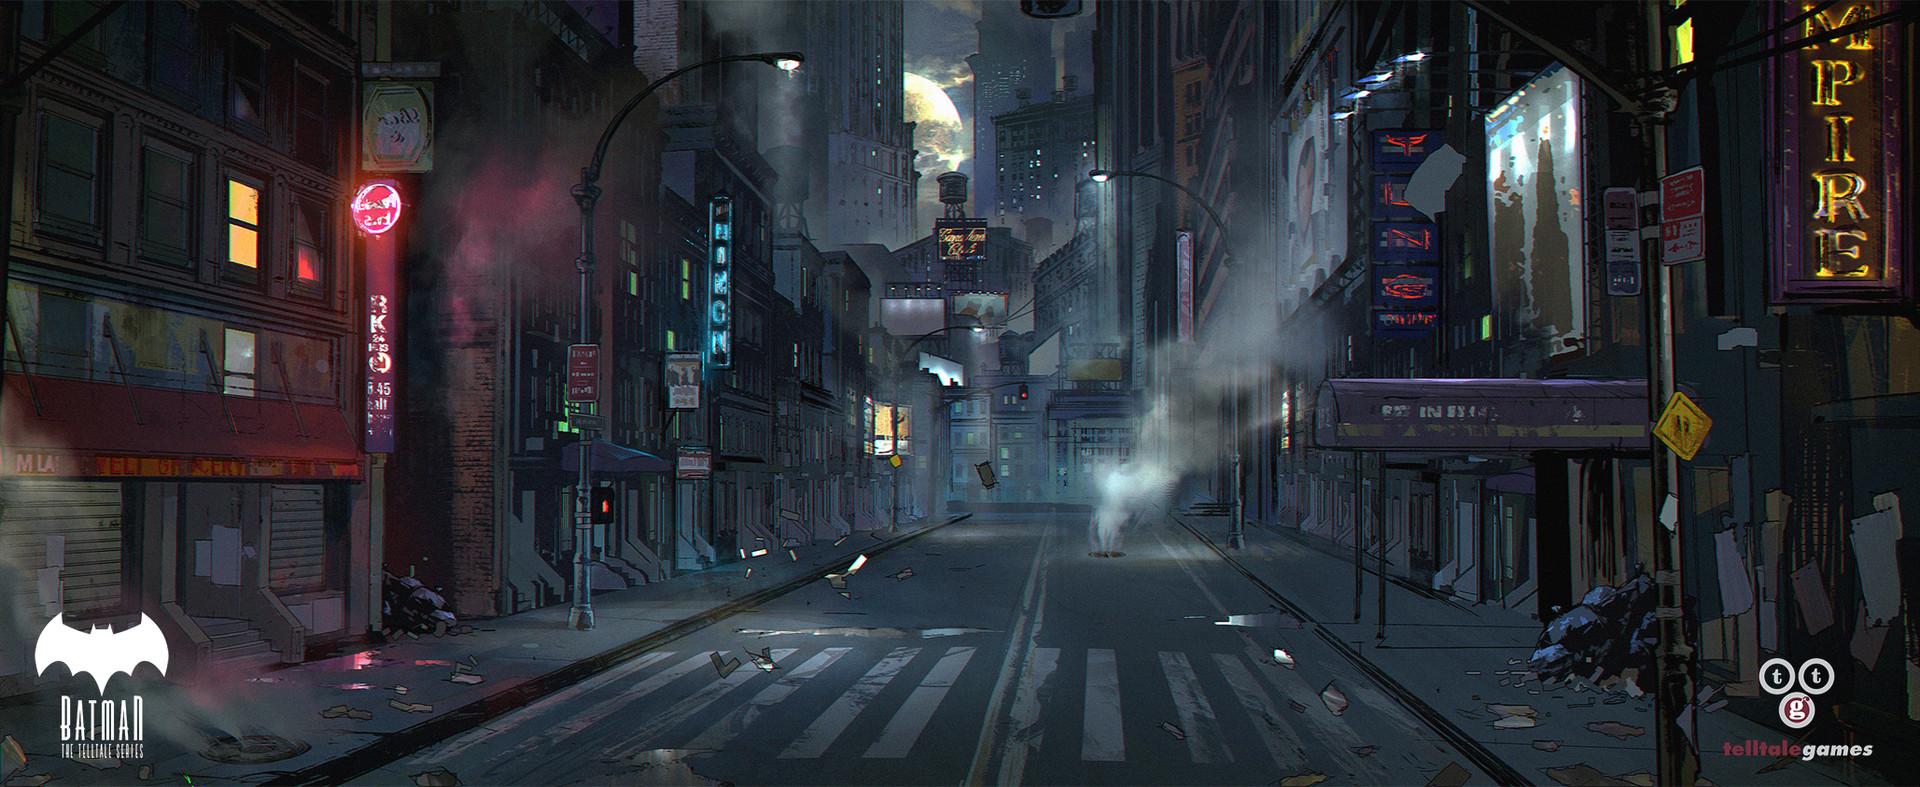 Michael_Broussard_fablehatch_digital_artist_illustration_0015.jpg